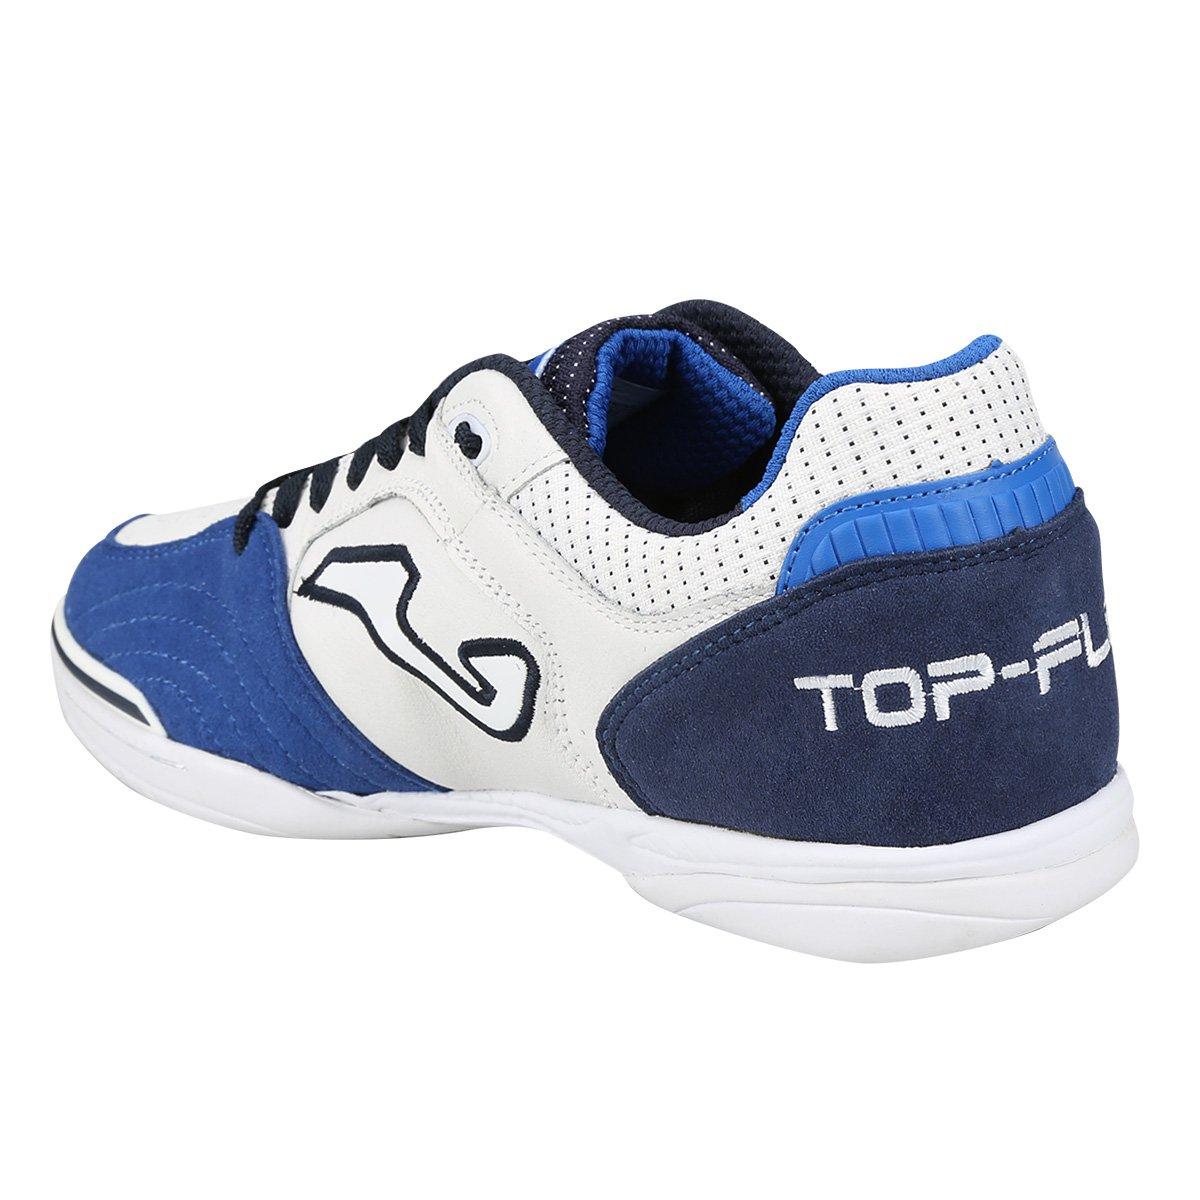 5efc6fa1f1 Chuteira Futsal Joma Top Flex